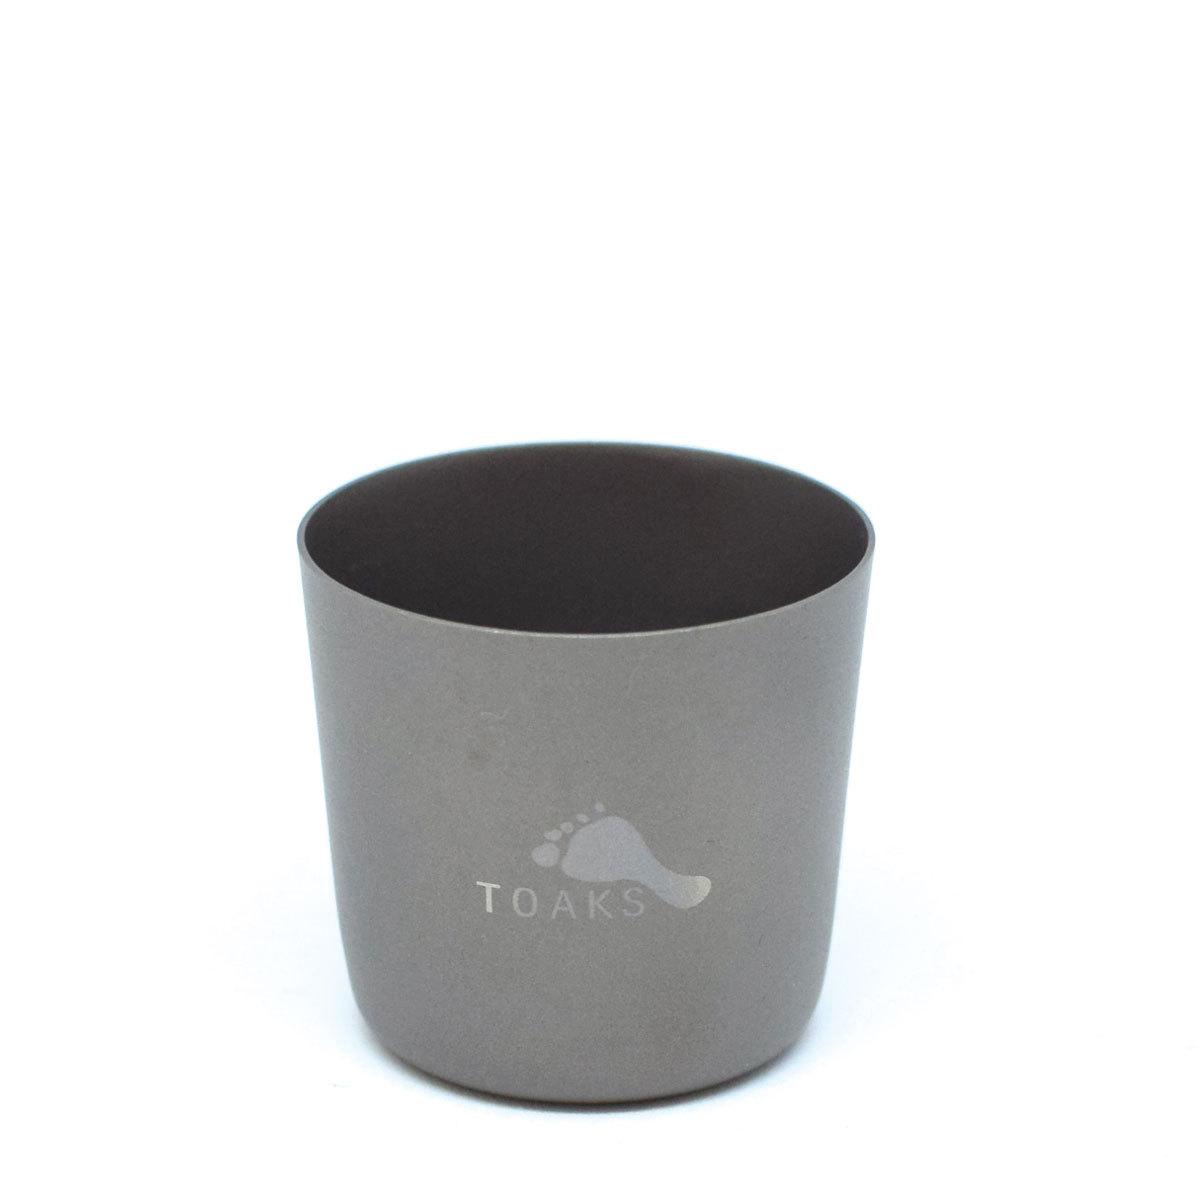 TOAKS(トークス)TITANIUM SHOT GLASS チタニウムショットグラス